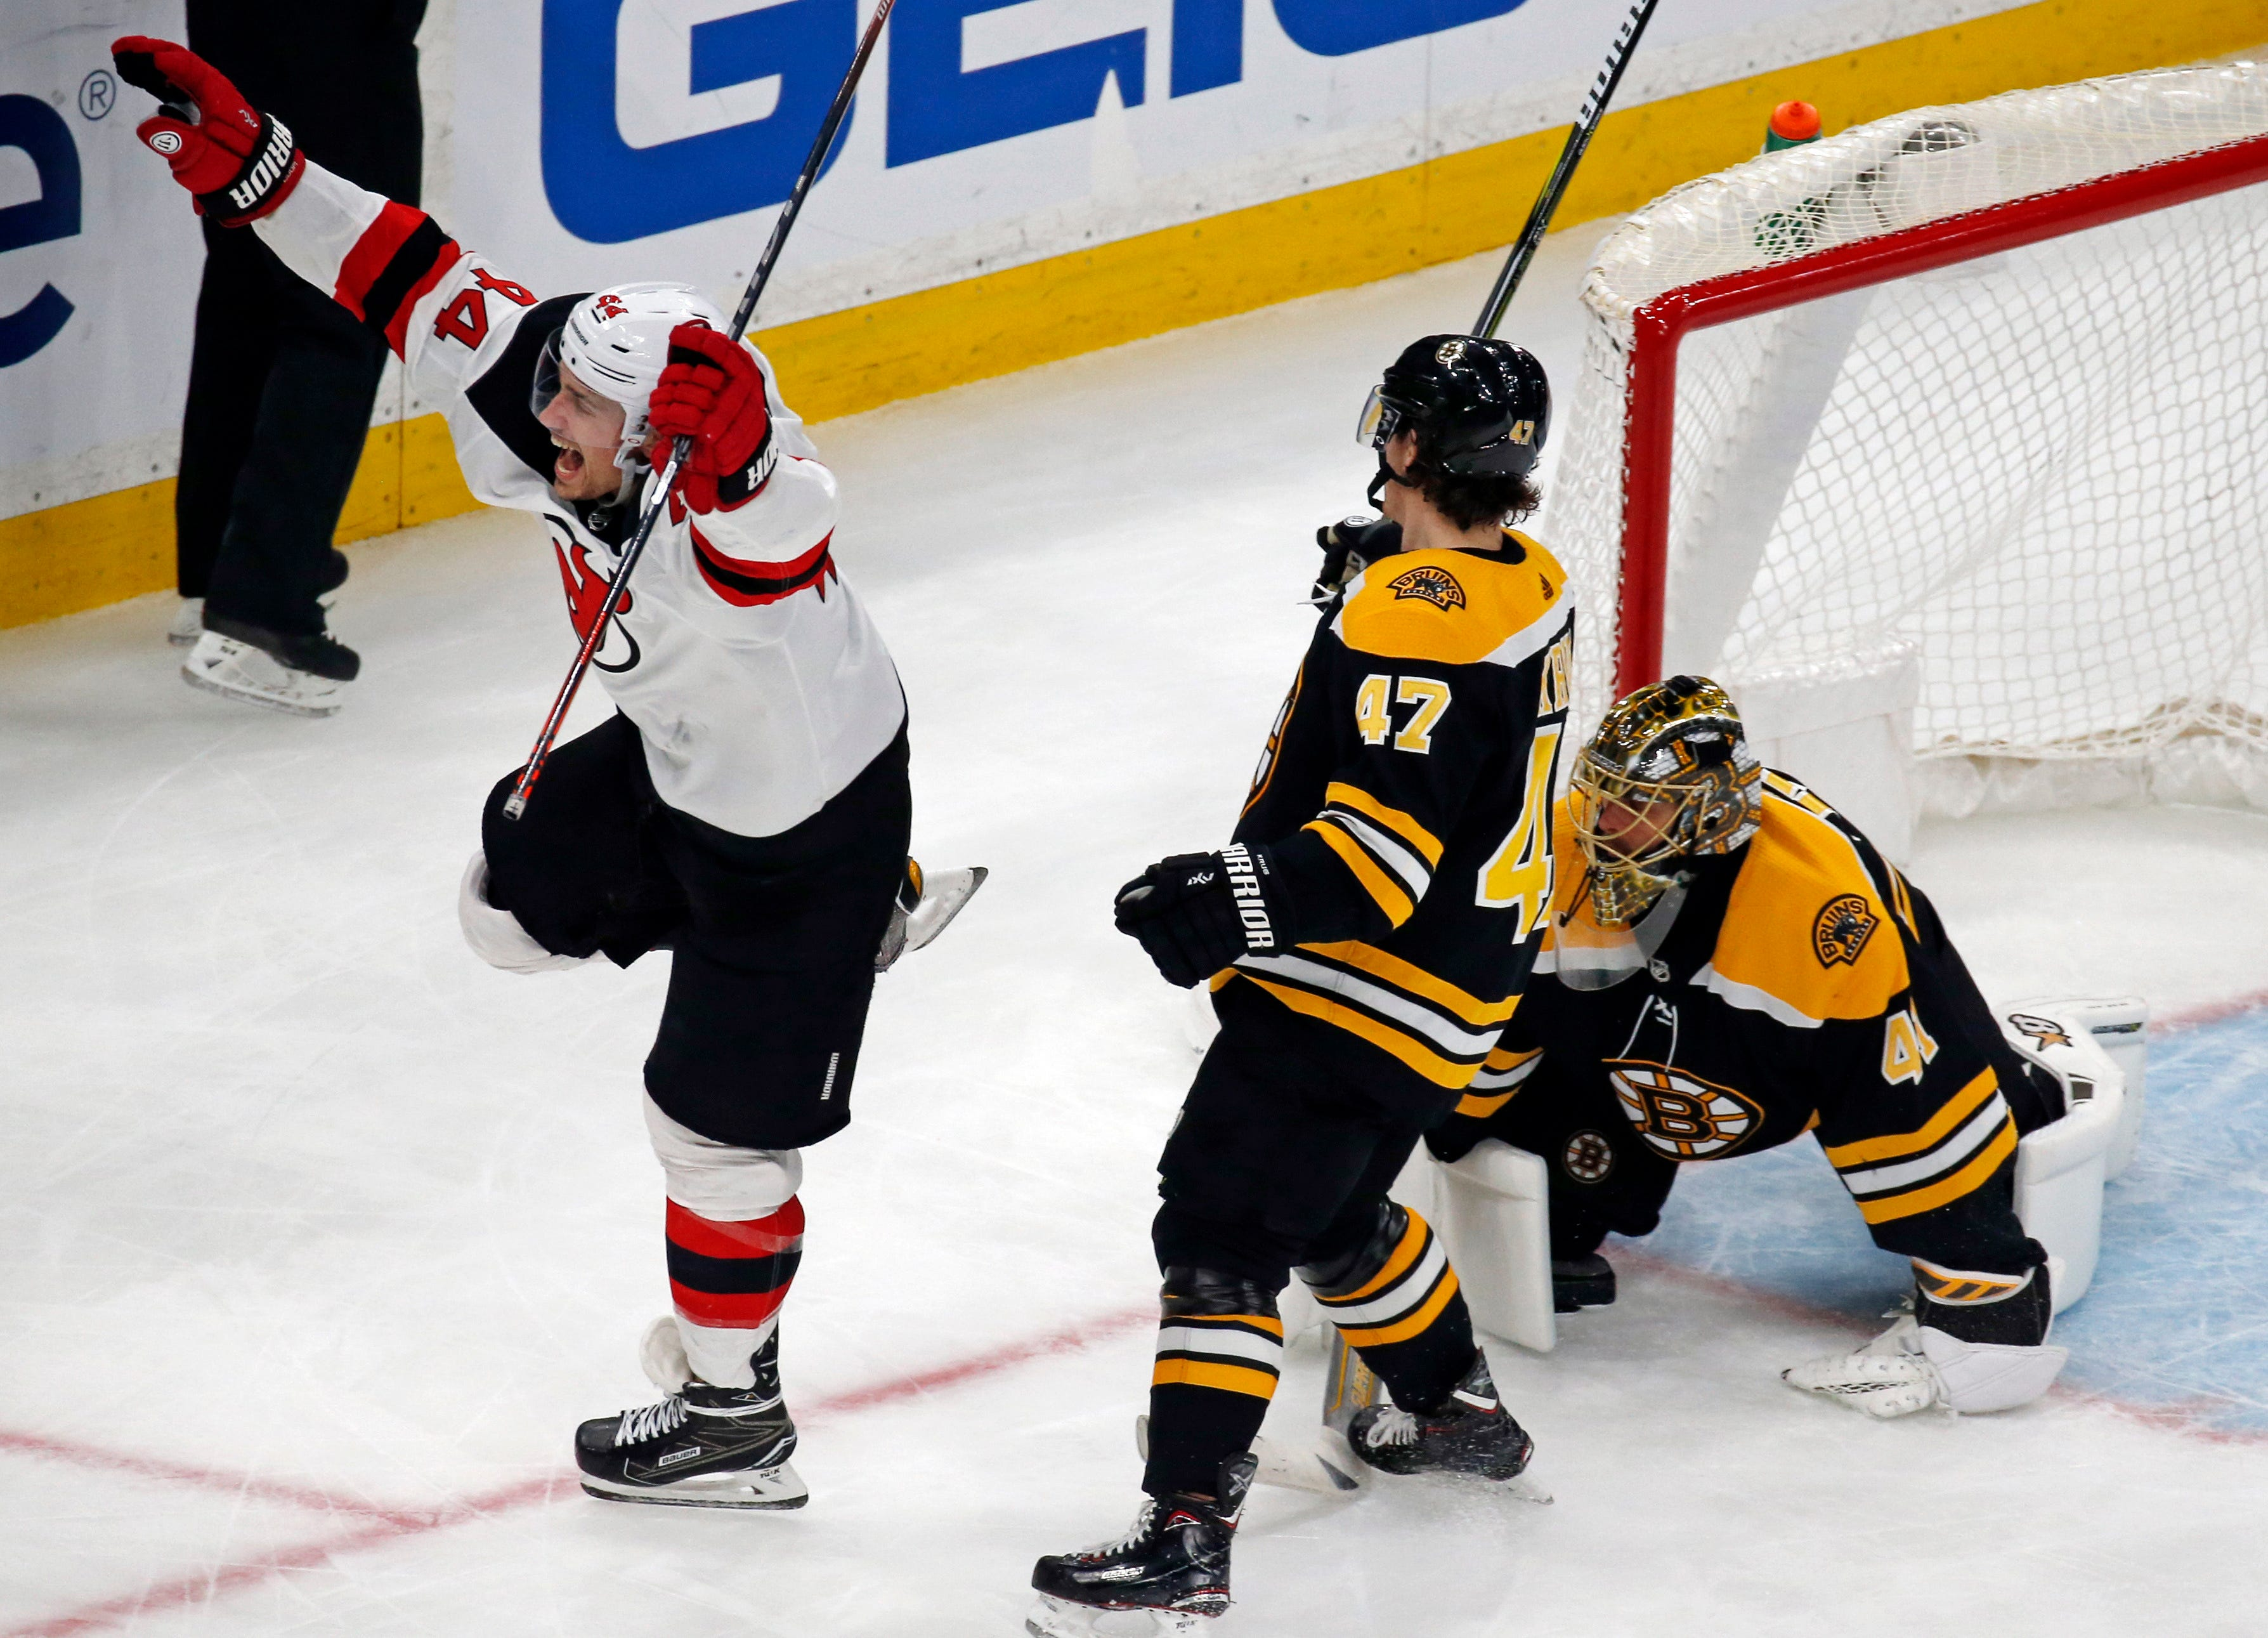 Blackwood picks up first NHL win, Devils beat Bruins 5-2